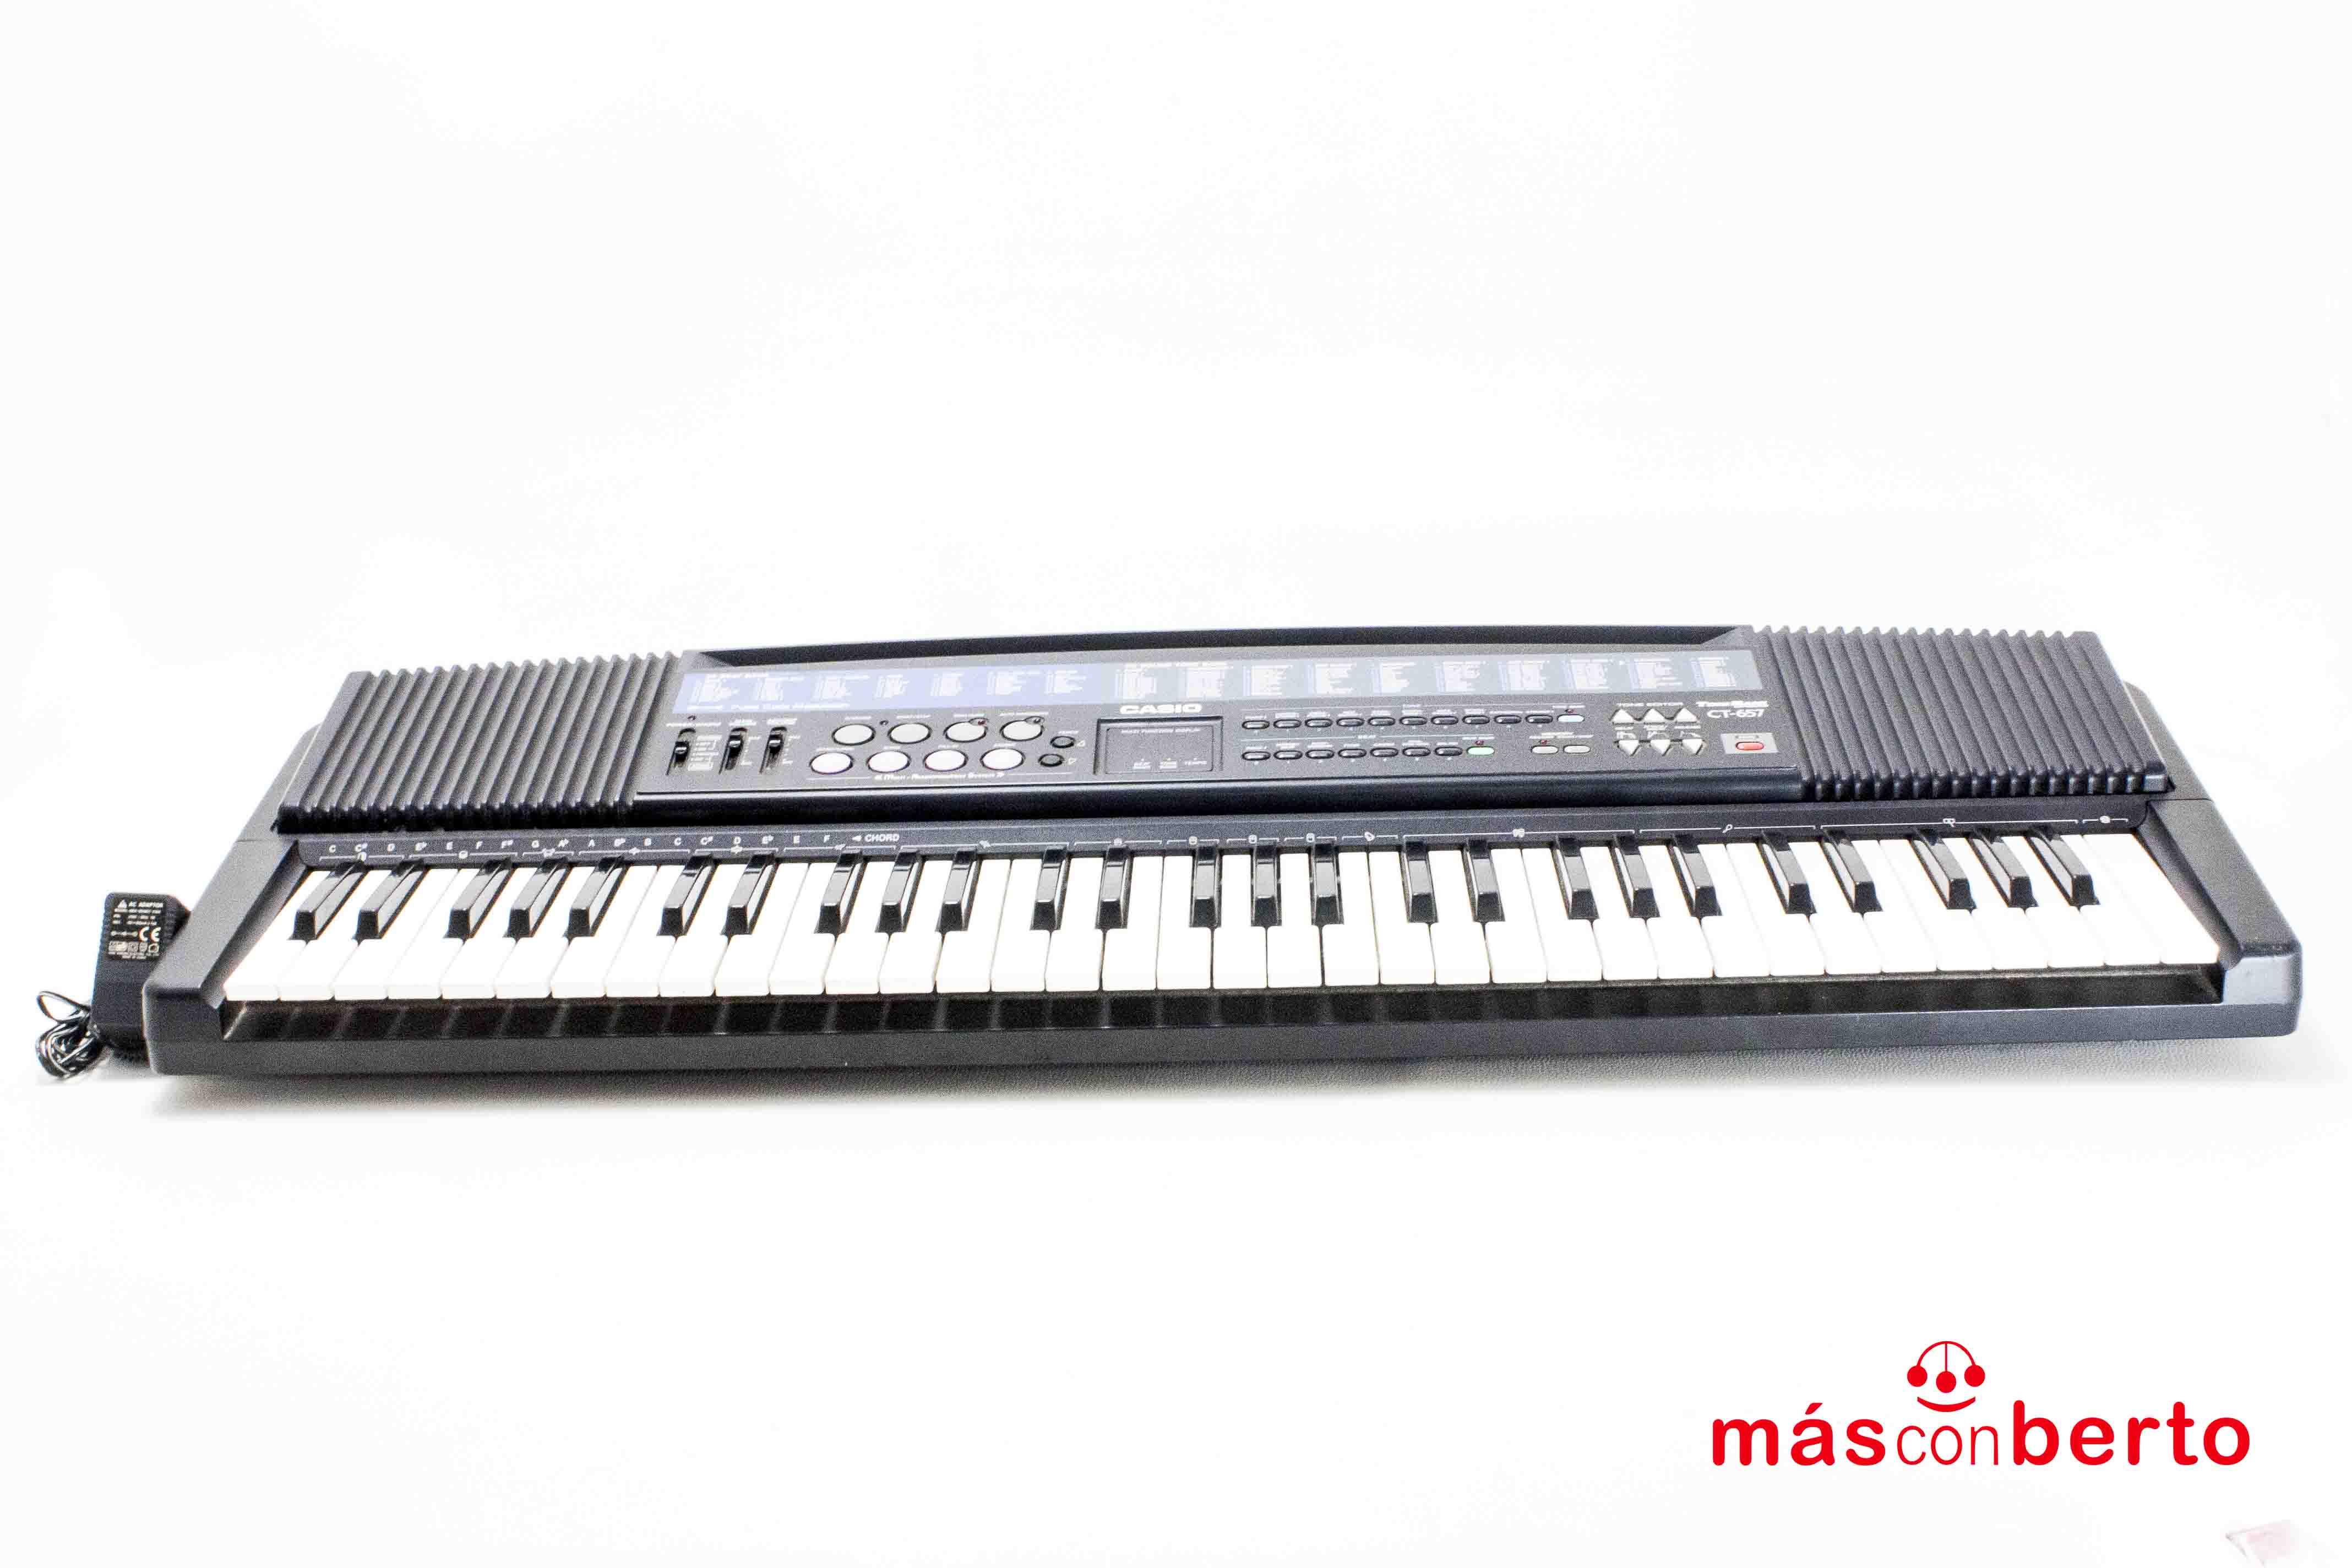 Teclado Casio modelo CT-657